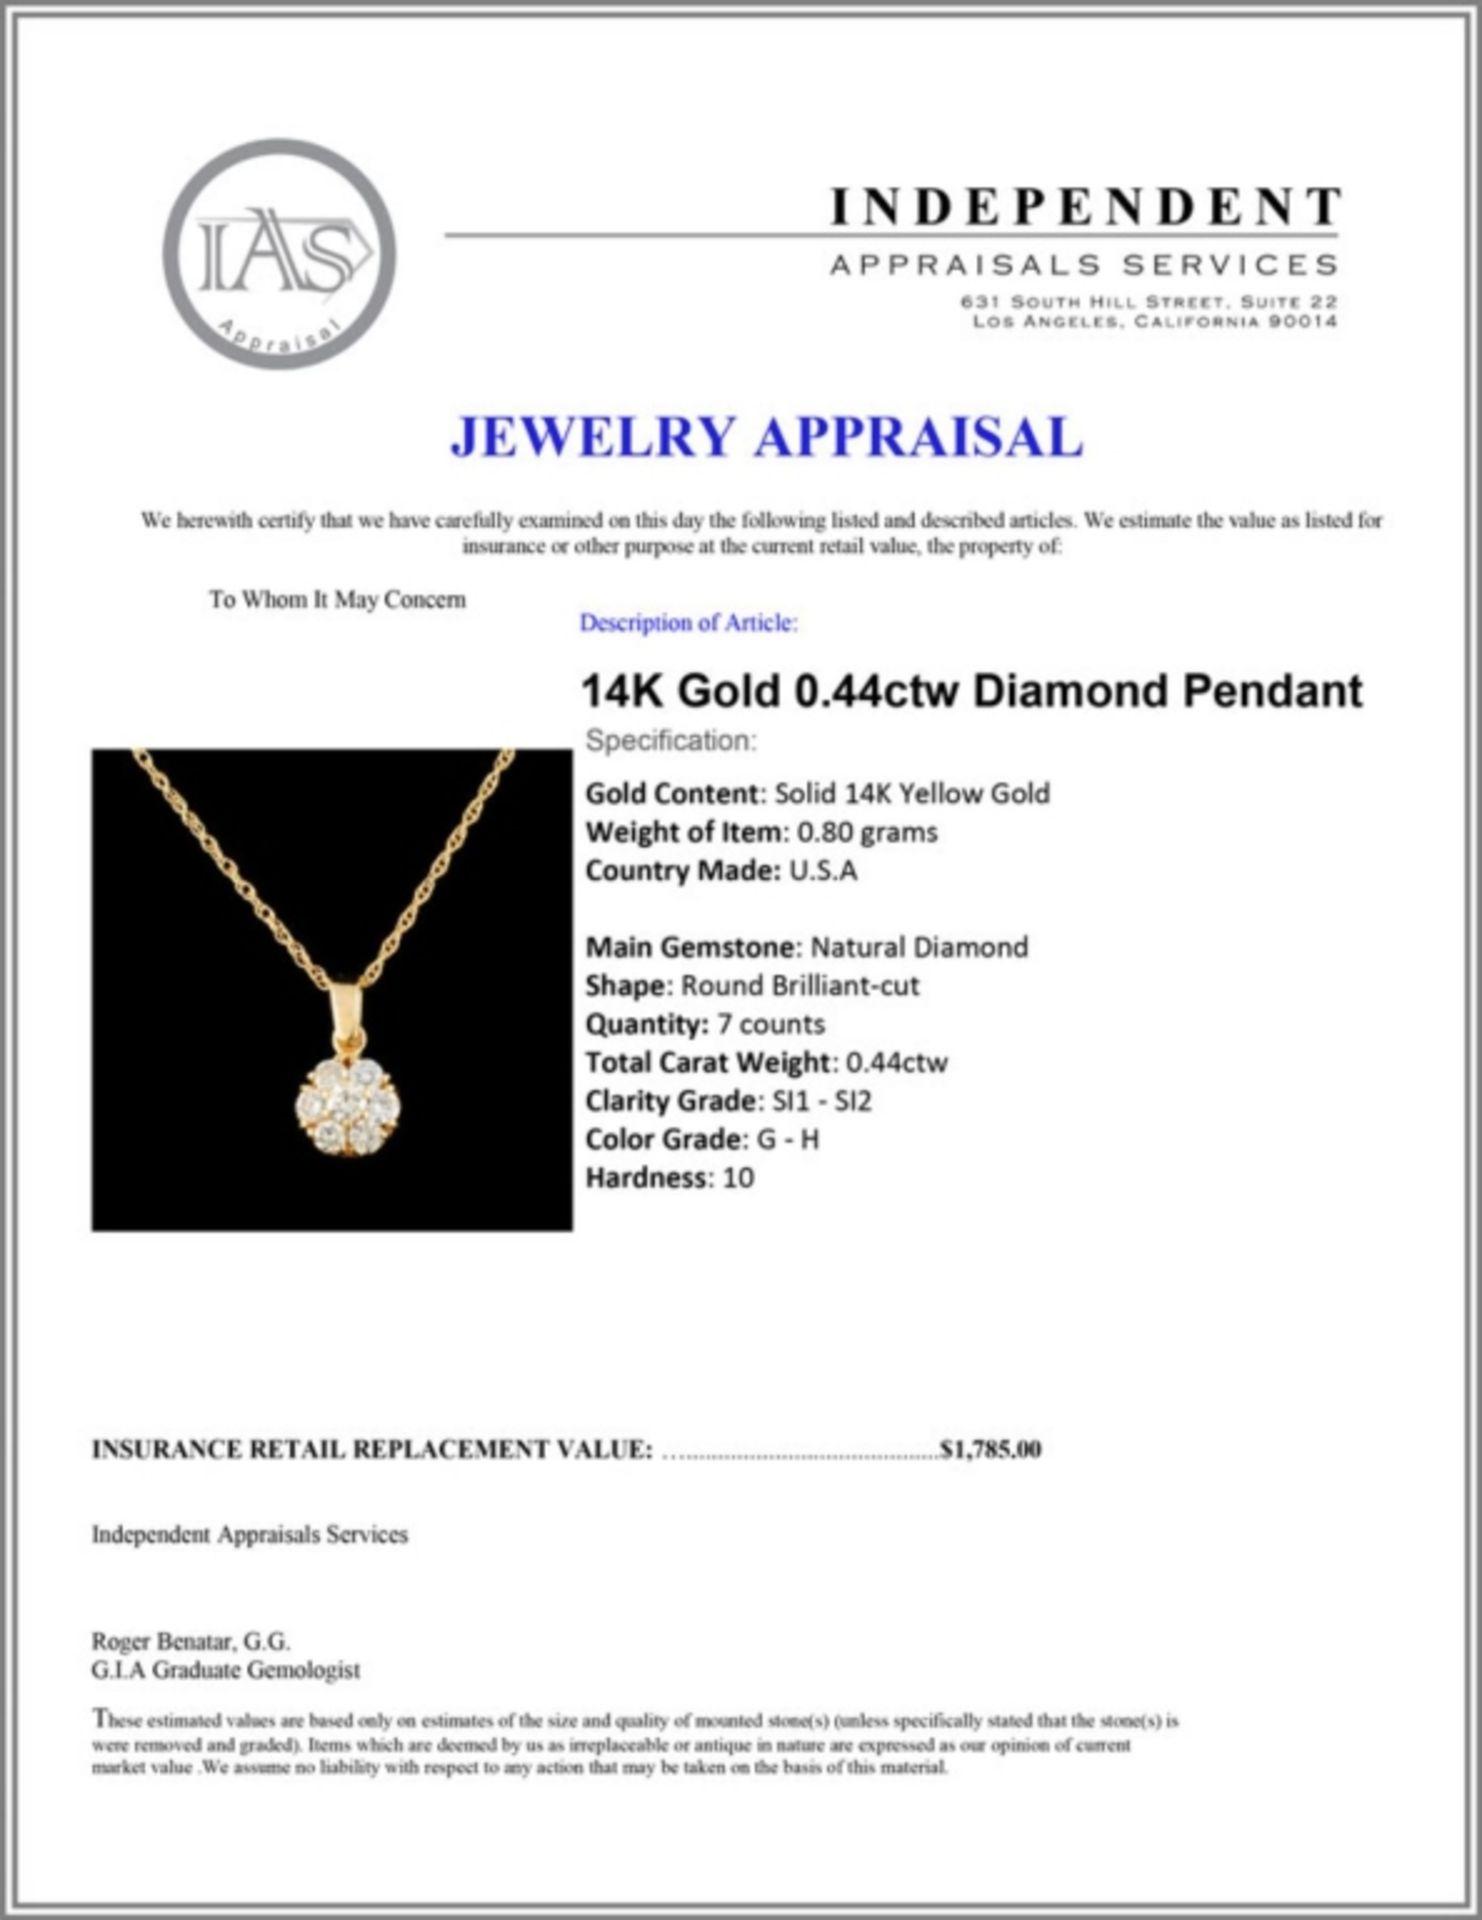 14K Gold 0.44ctw Diamond Pendant - Image 4 of 4